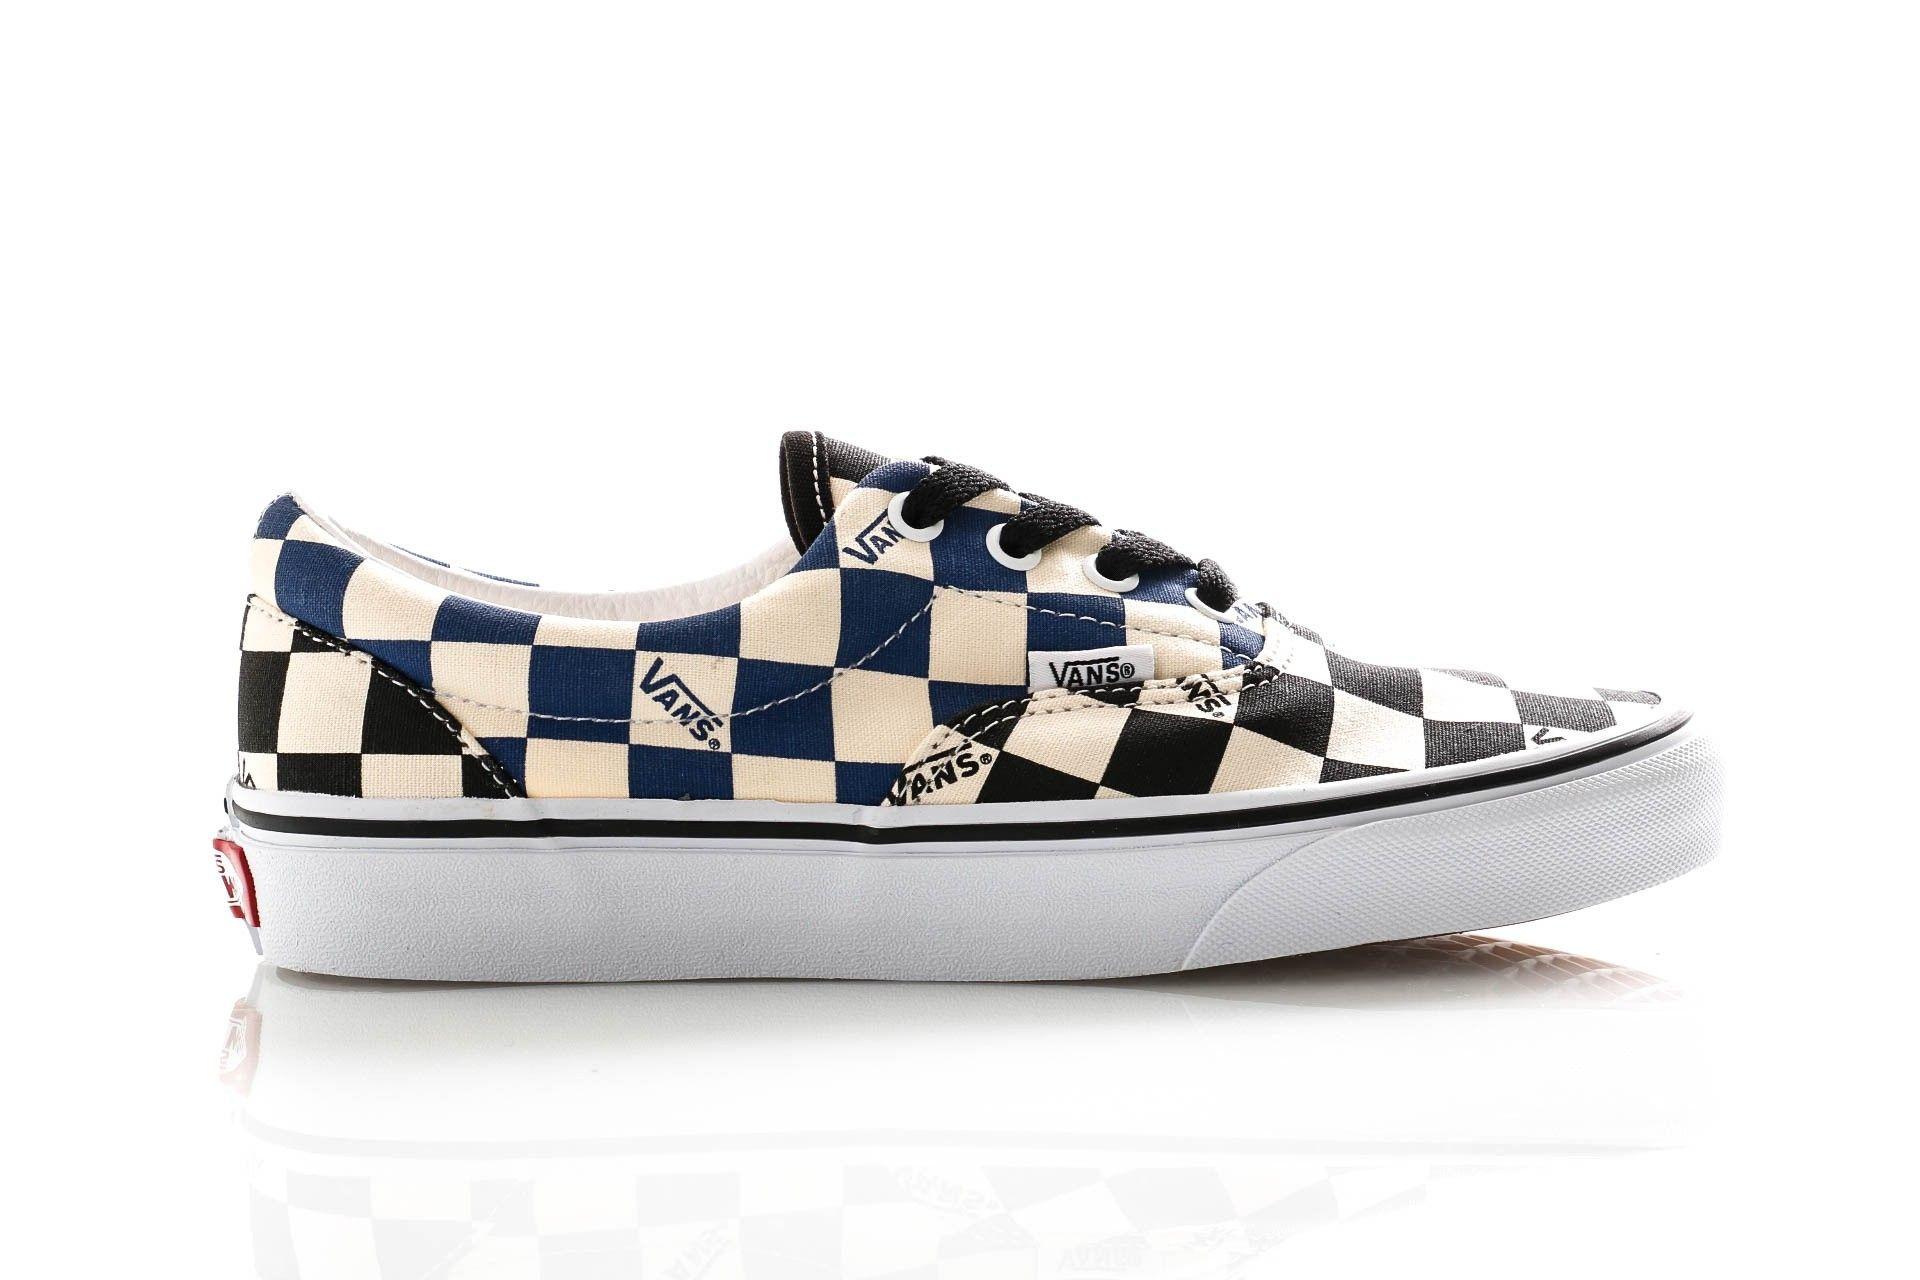 Afbeelding van Vans Sneakers Ua Era (Big Check) Black/Navy VN0A4U39WRT1